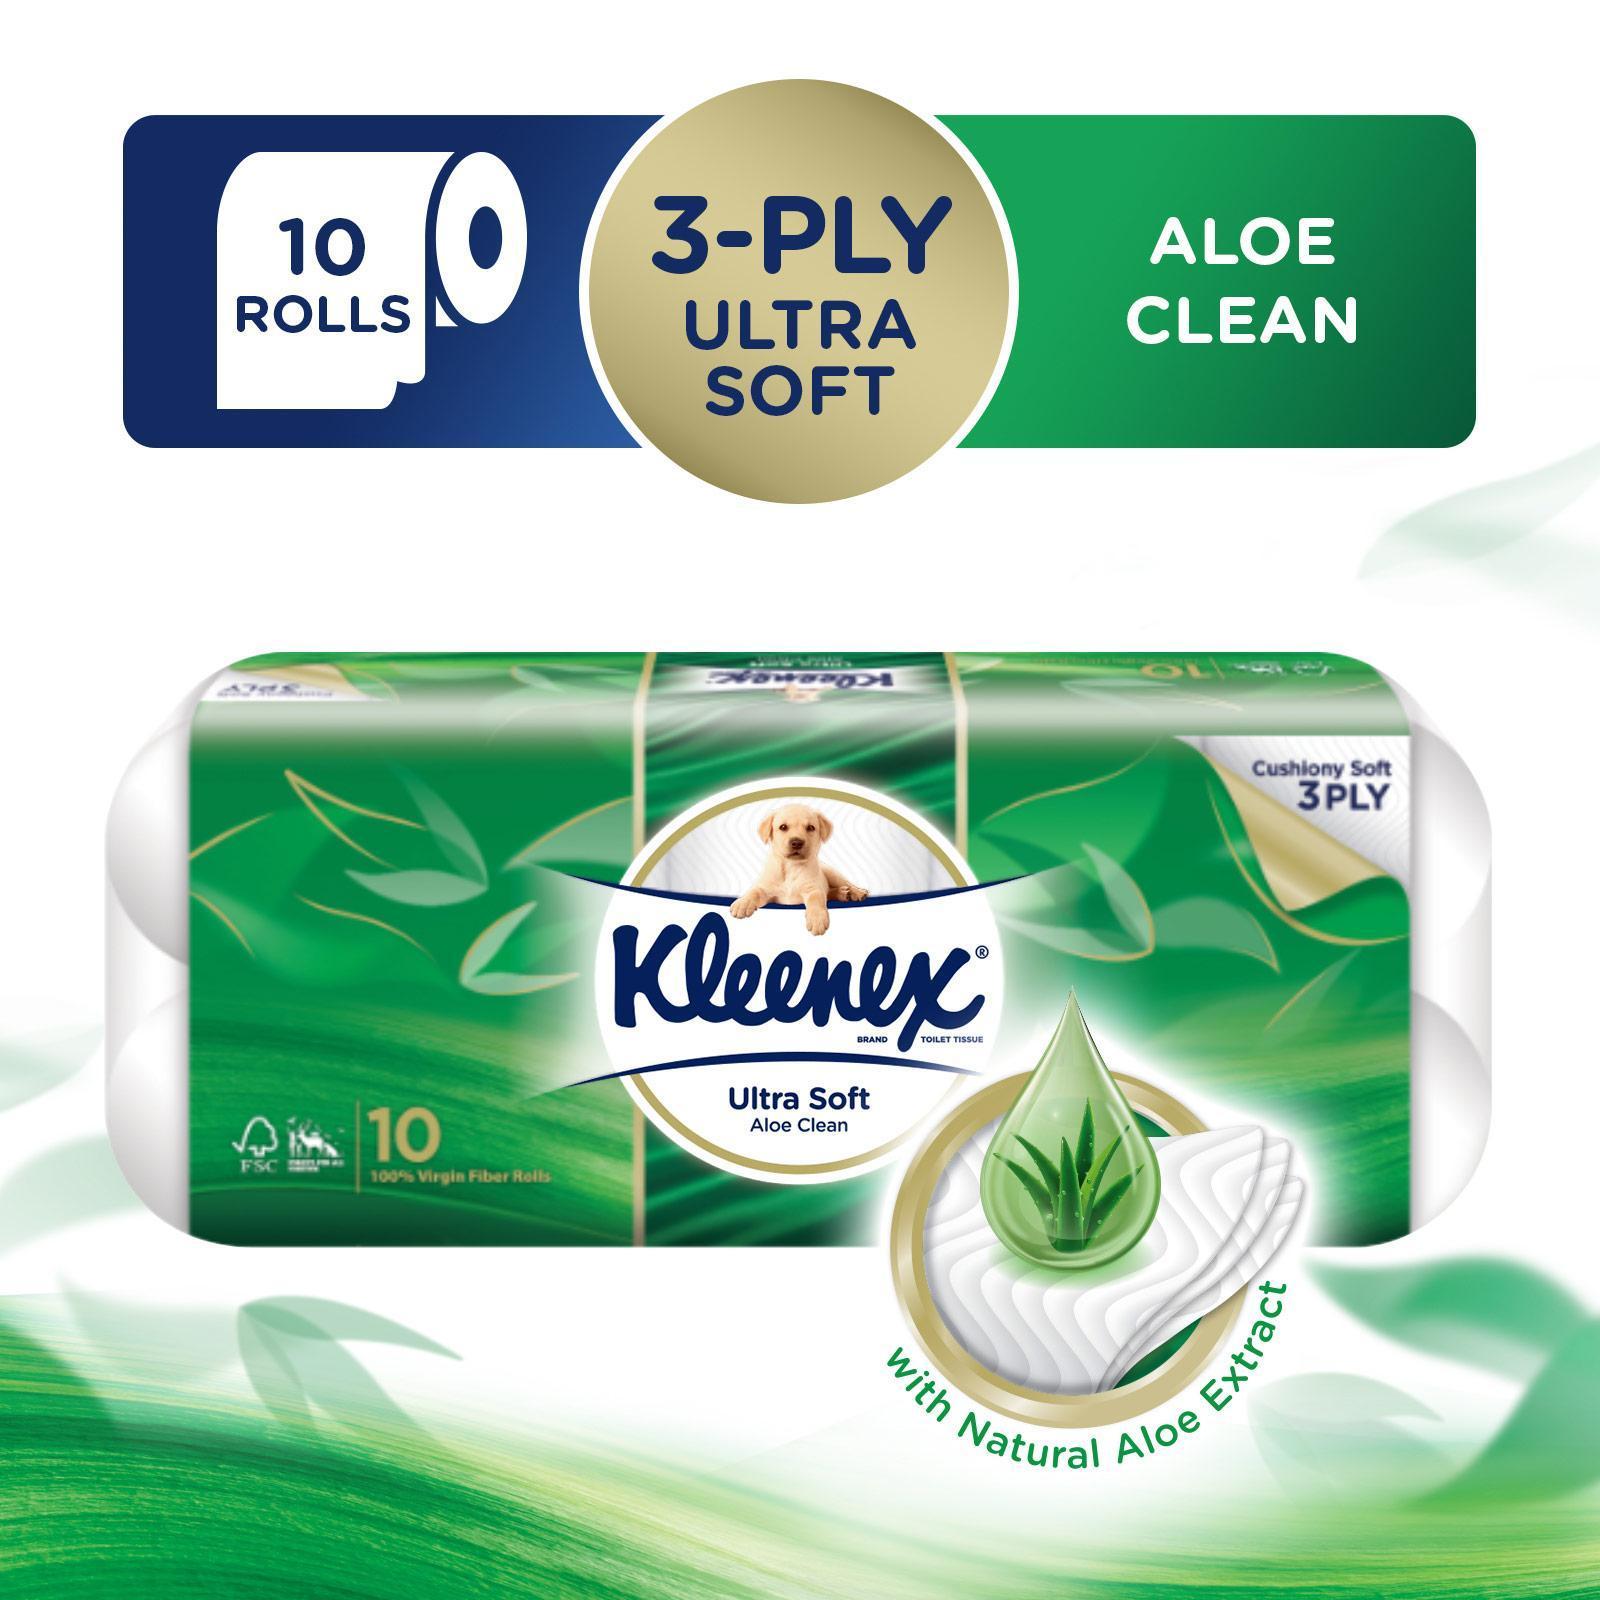 Kleenex Ultra Soft Aloe Clean 3-Ply Toilet Tissue - 10 Rolls